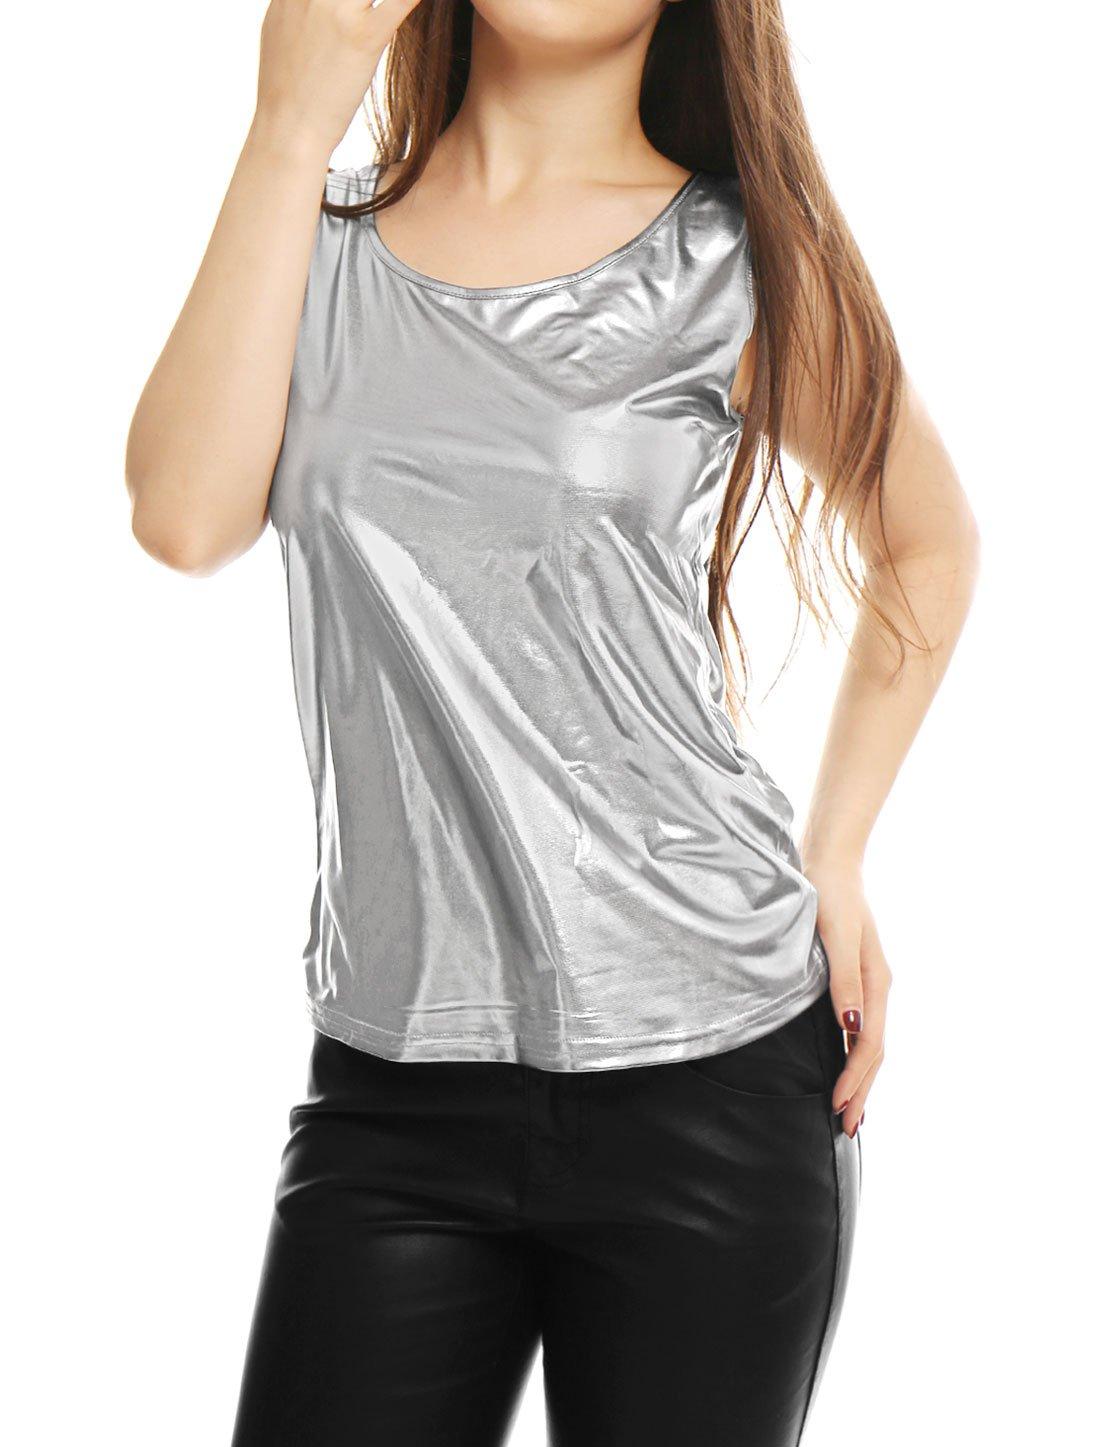 Allegra K Women's U Neck Stretchy Slim Fit Metallic Tank Top Silver XS (US 2)